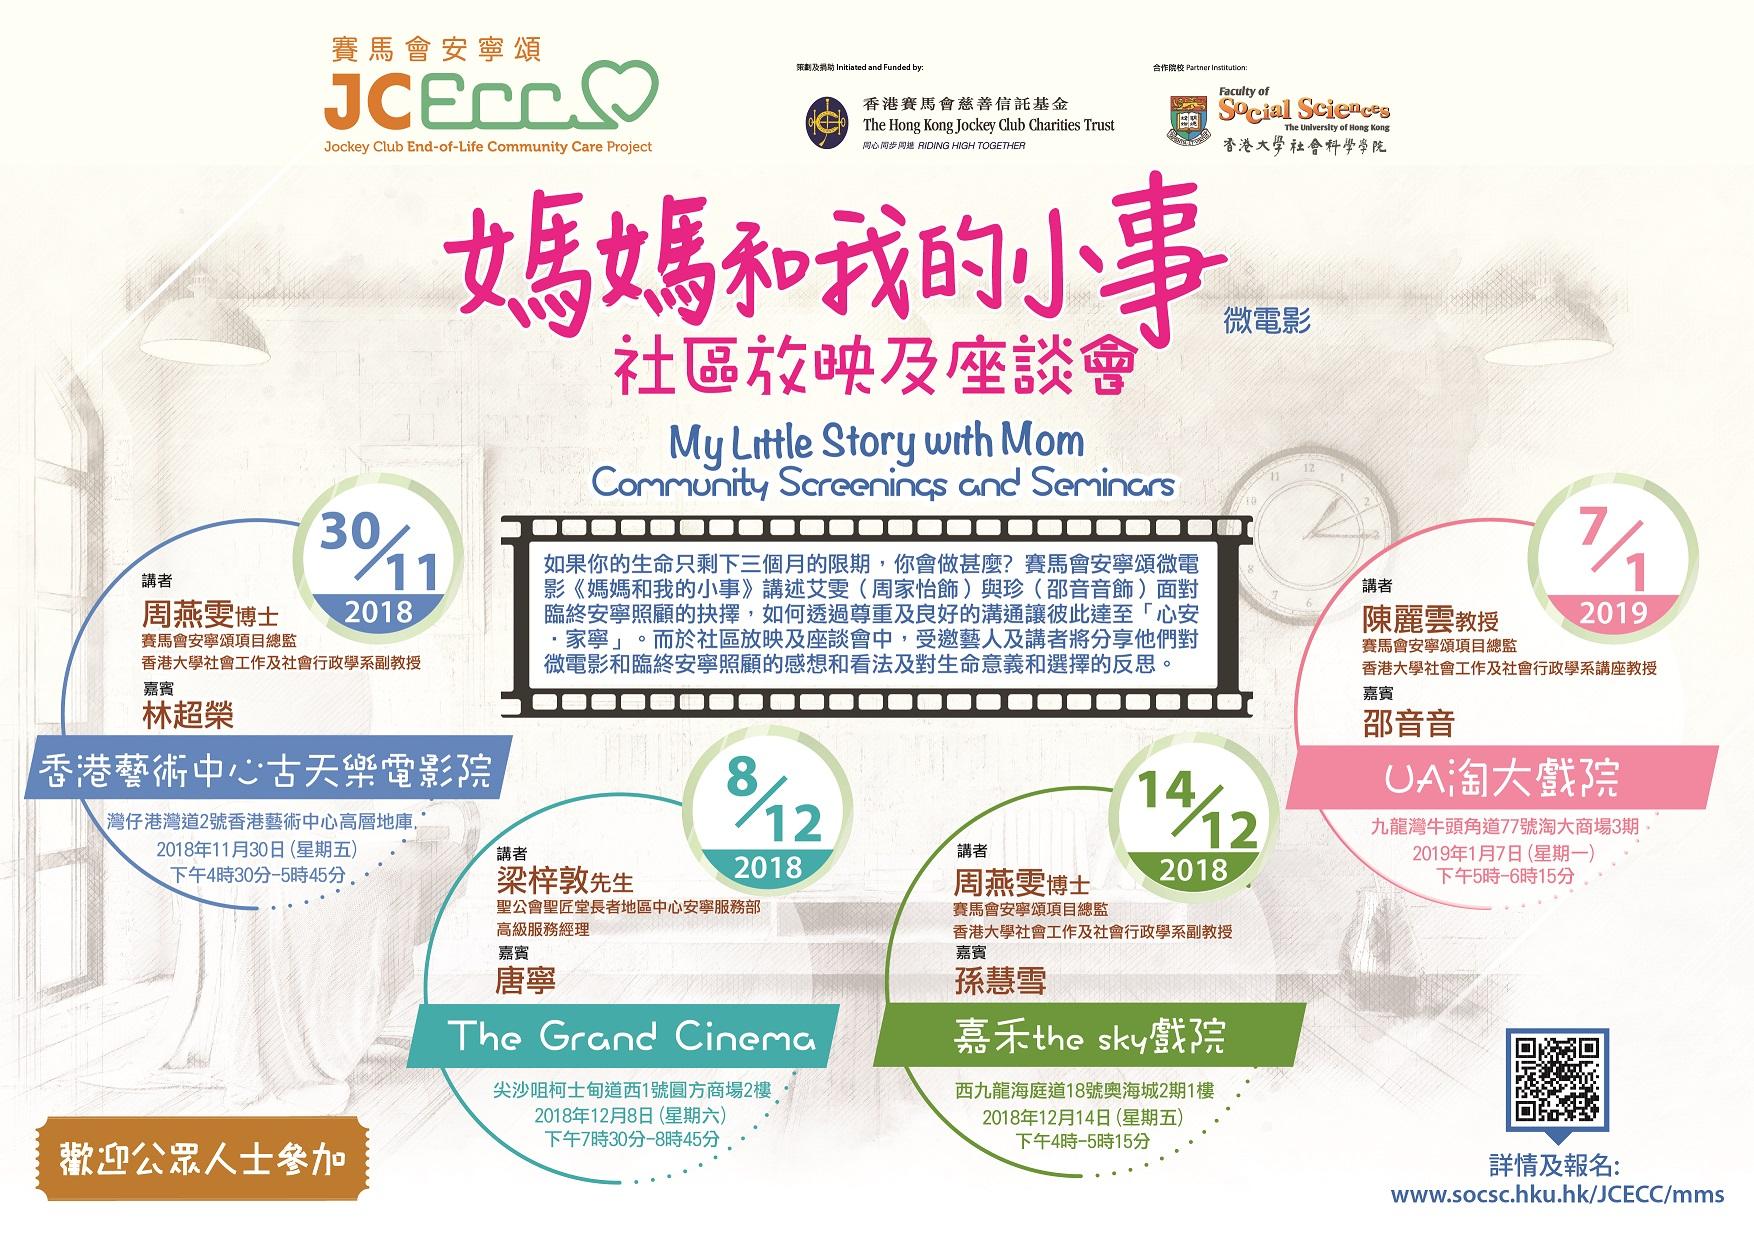 JCECCminiMovSeminars_vr8-01_reduced size